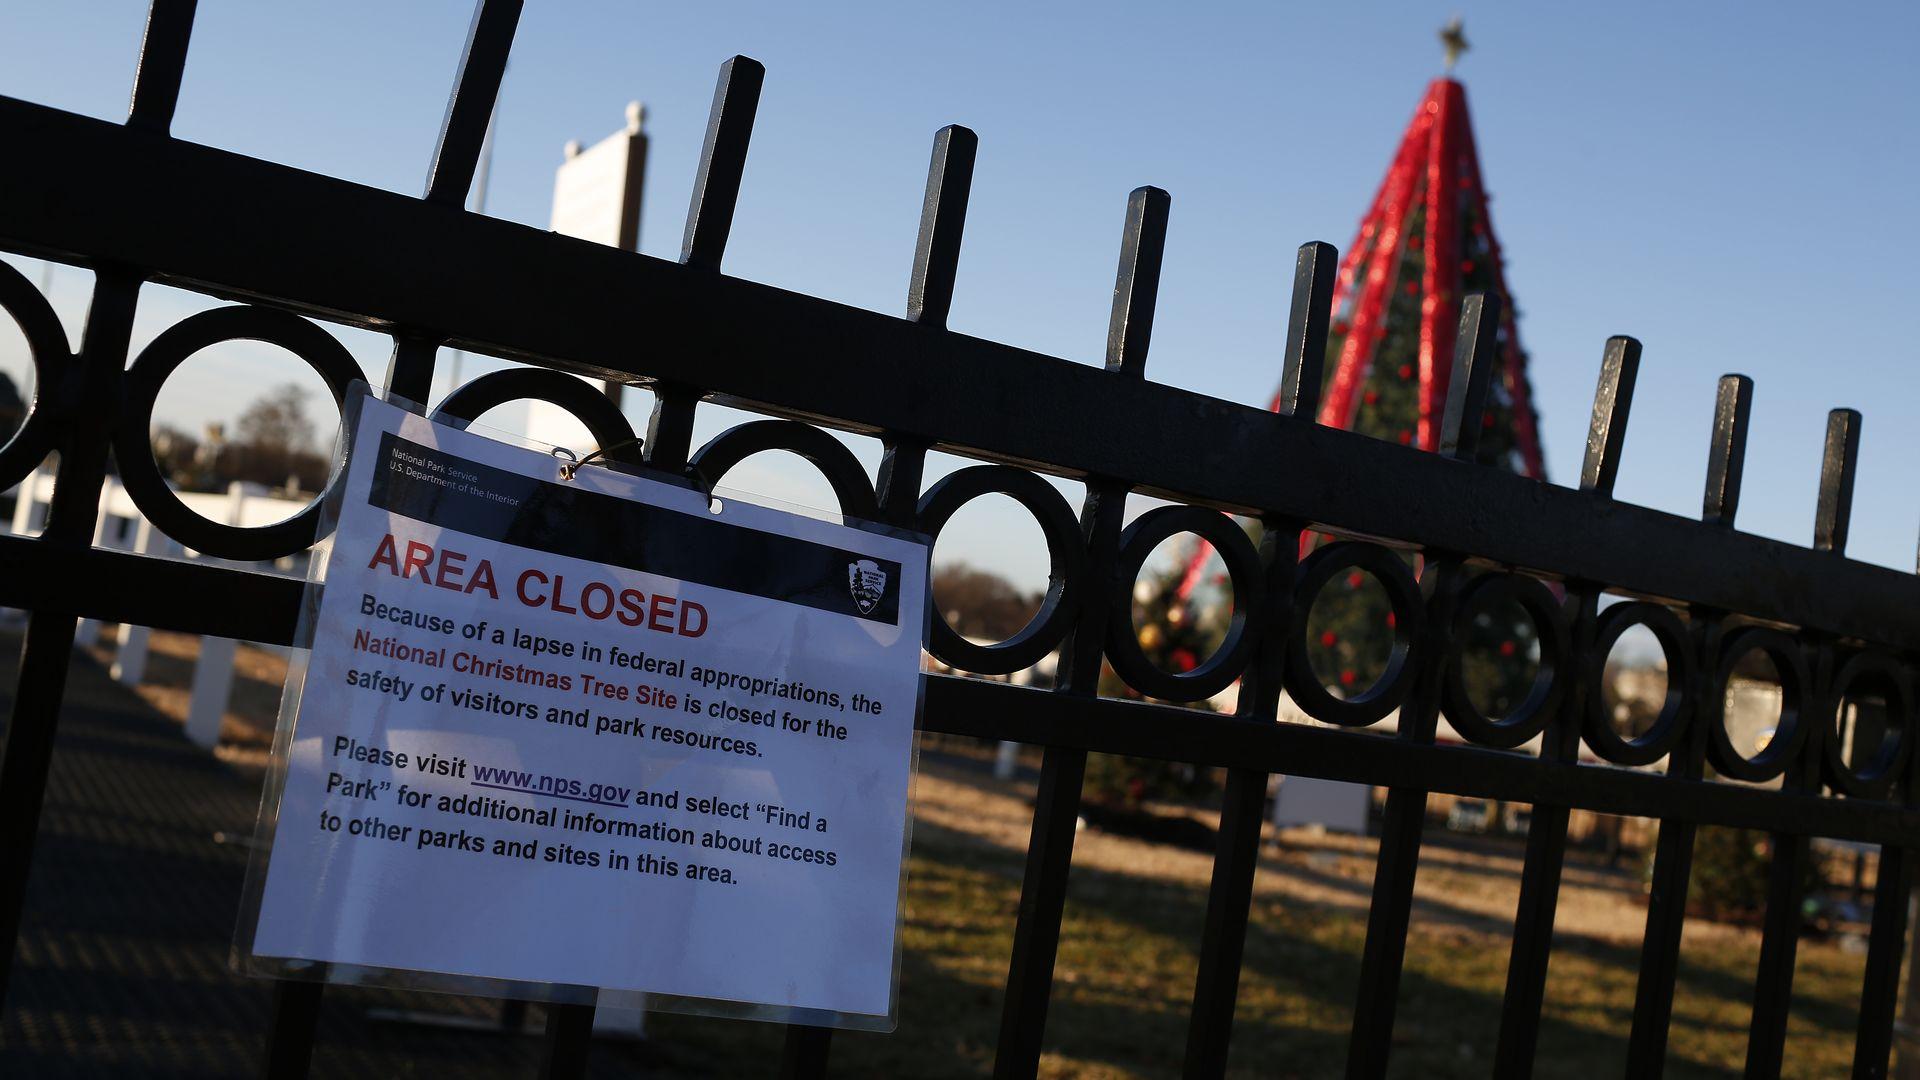 National christmas tree closed due to shutdown